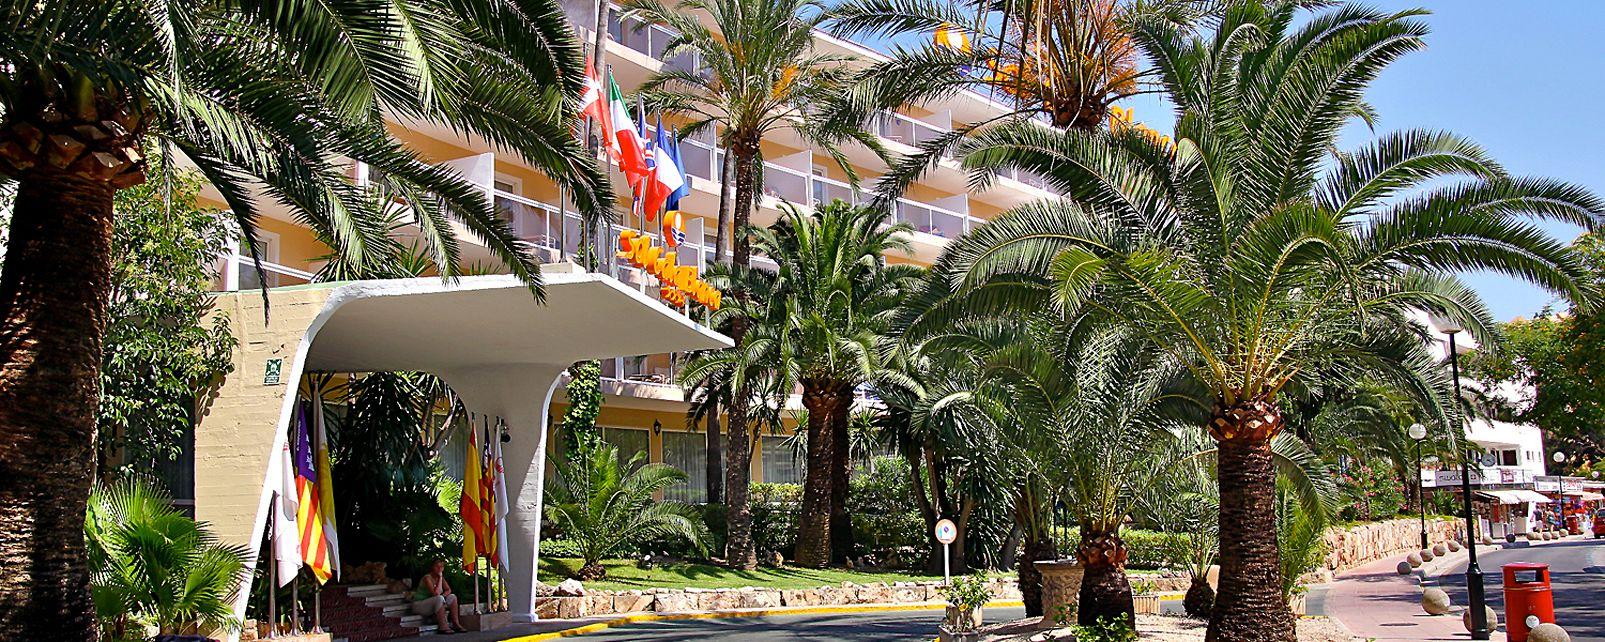 Hôtel Sol Cala Blanca